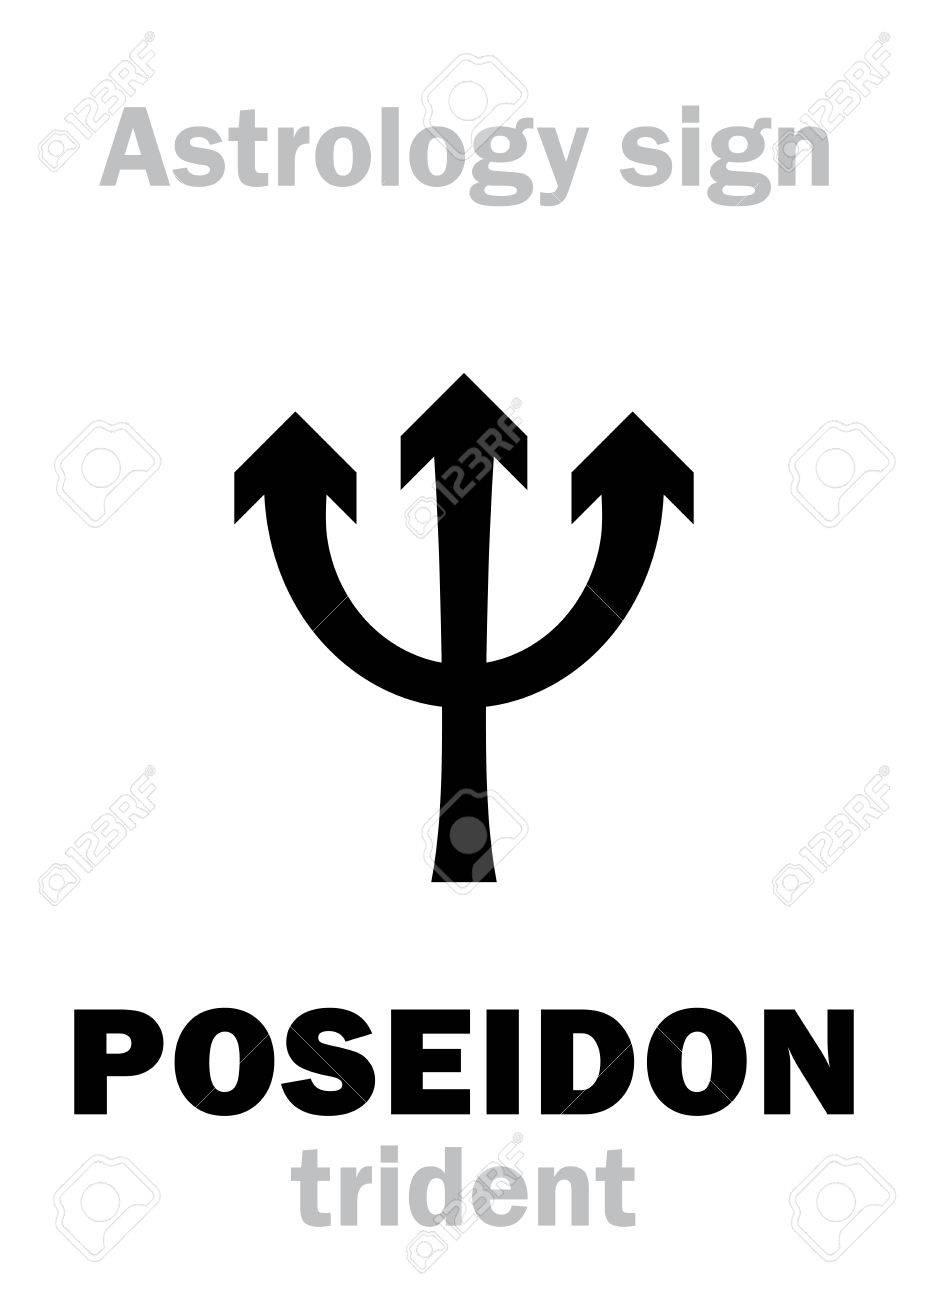 Astrology alphabet neptune poseidons trident hieroglyphics astrology alphabet neptune poseidons trident hieroglyphics character sign single symbol biocorpaavc Choice Image